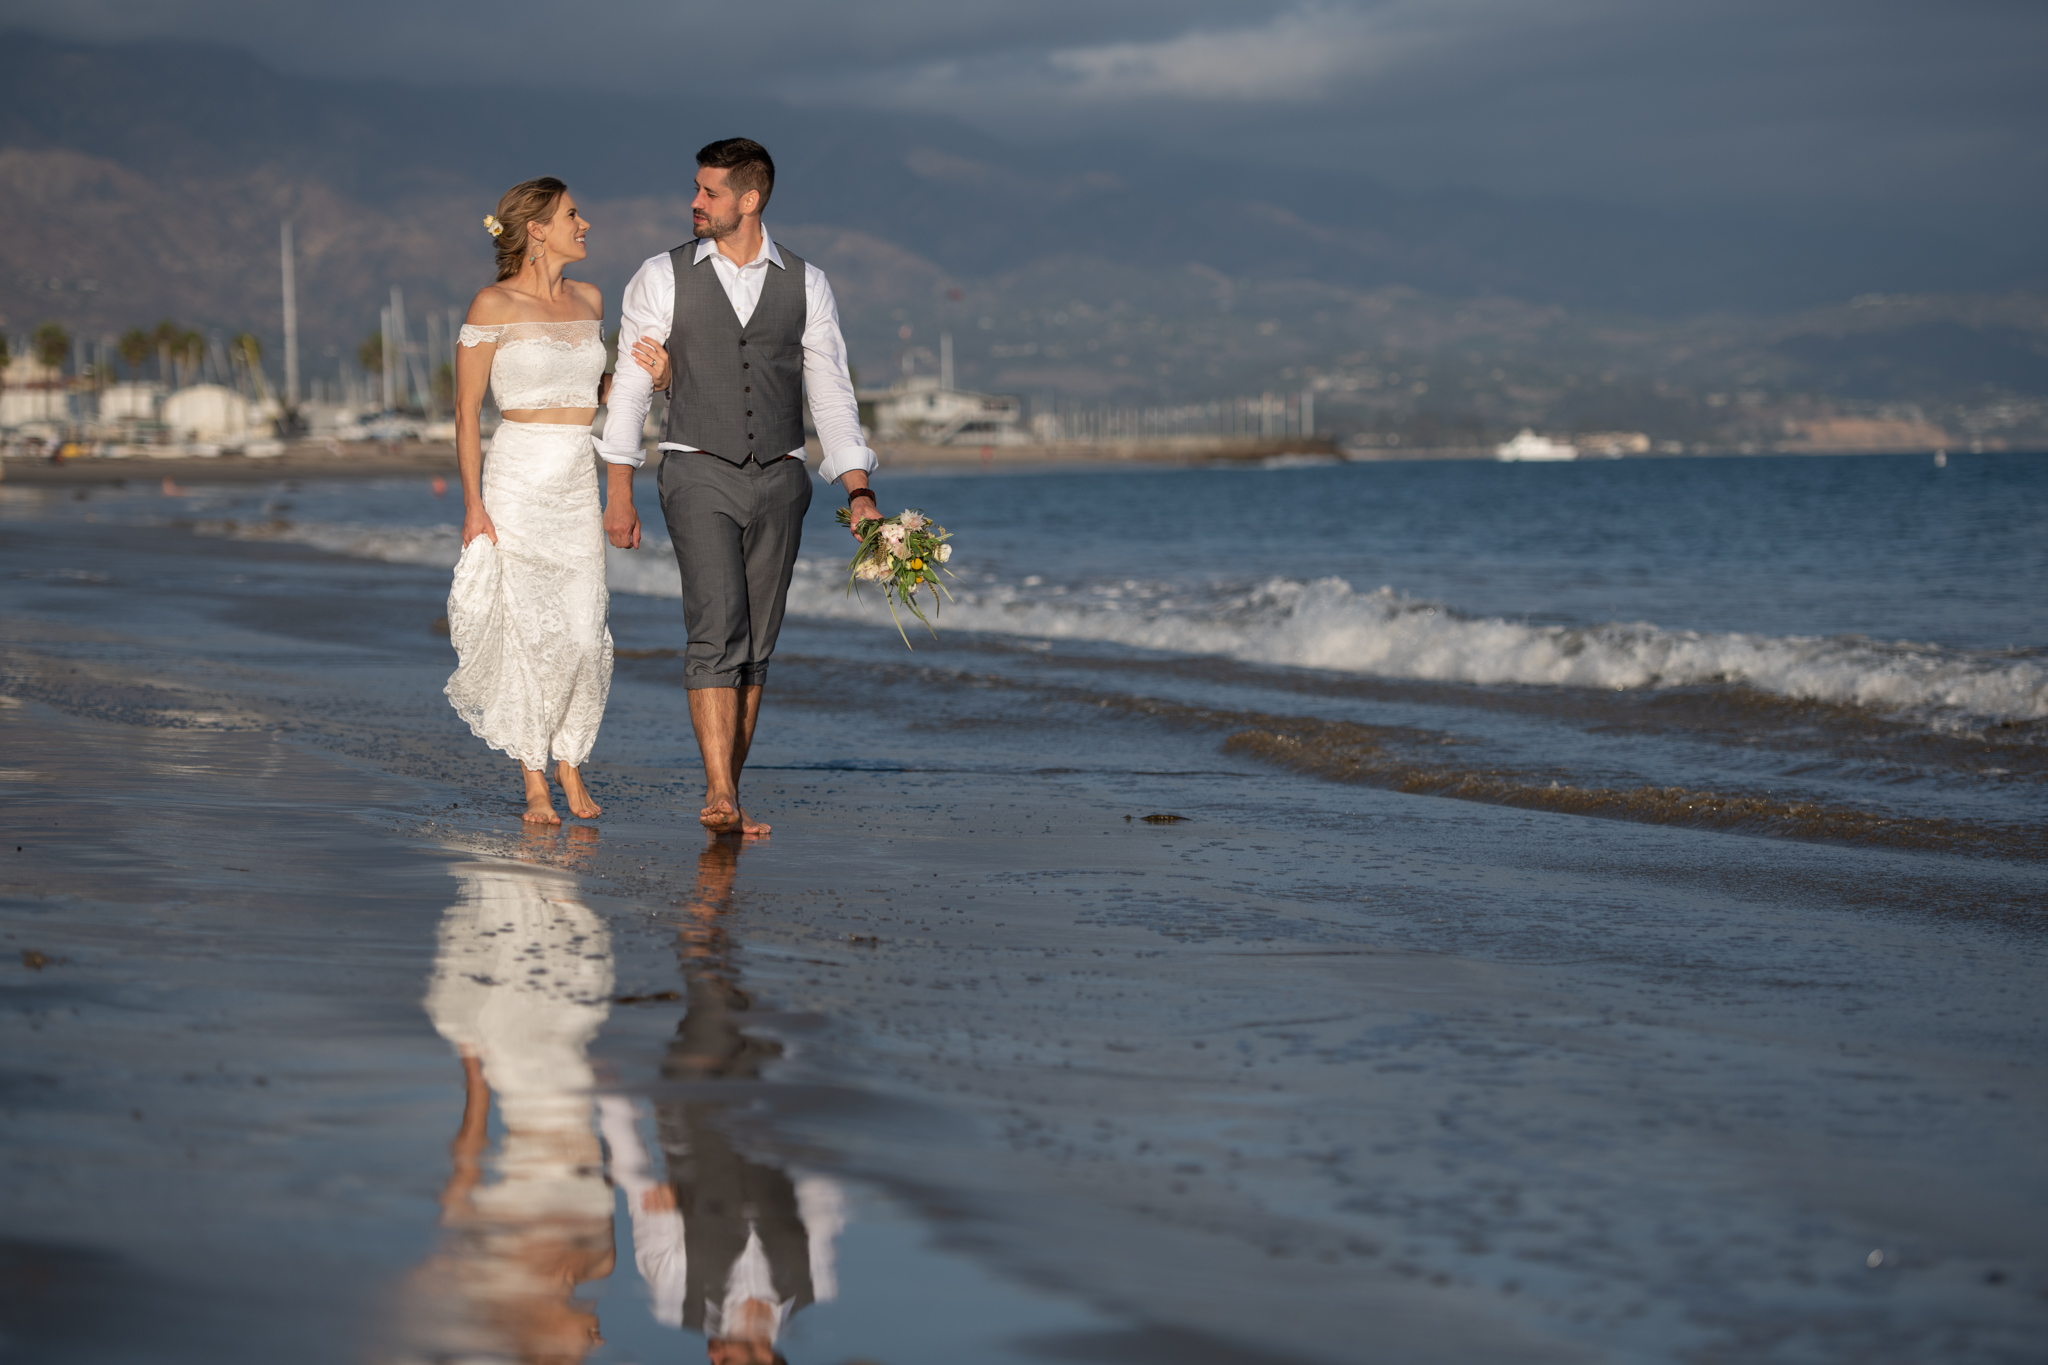 63_PRVW_Jenny_Ken_Wedding_Trevor_Hooper_Photo.jpg